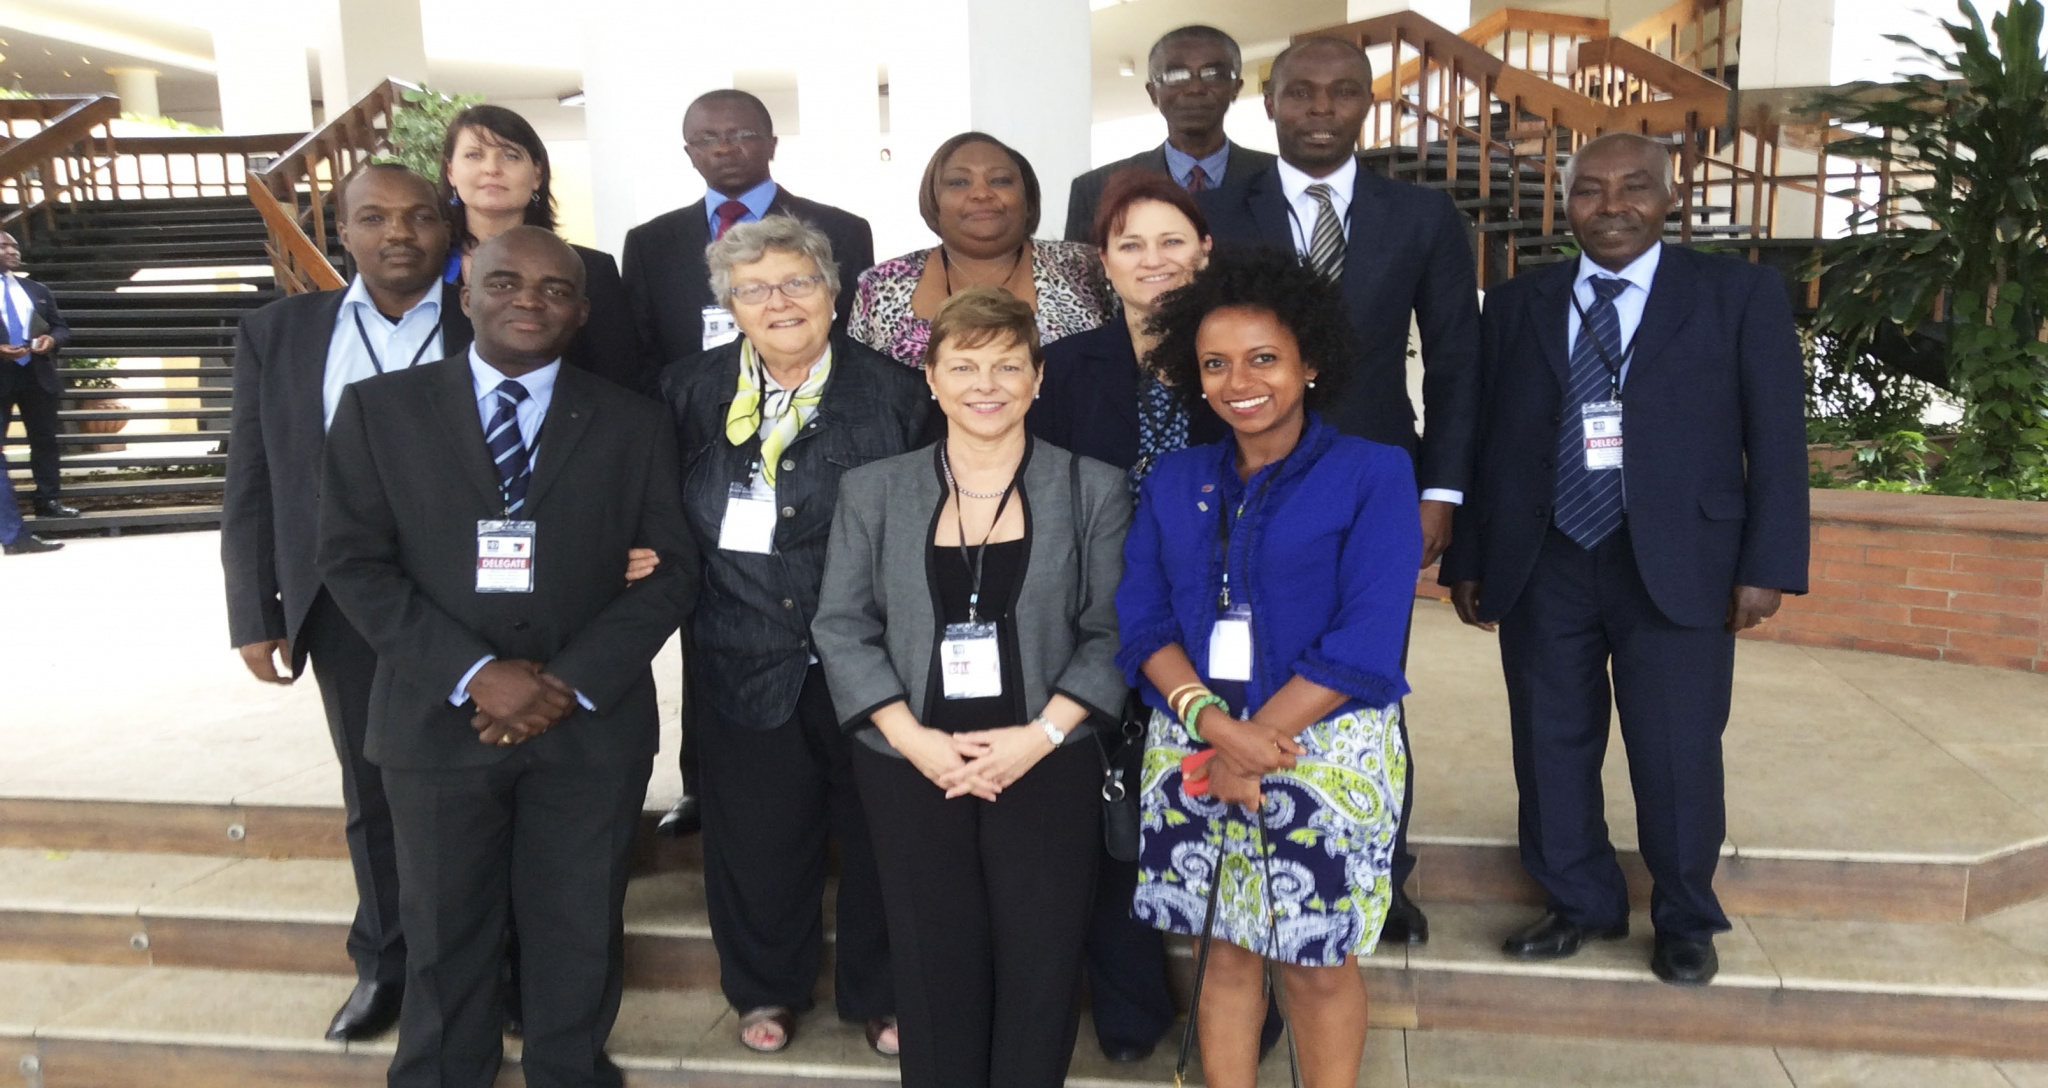 ACGN meeting at Nigeria Lagos, July 2015